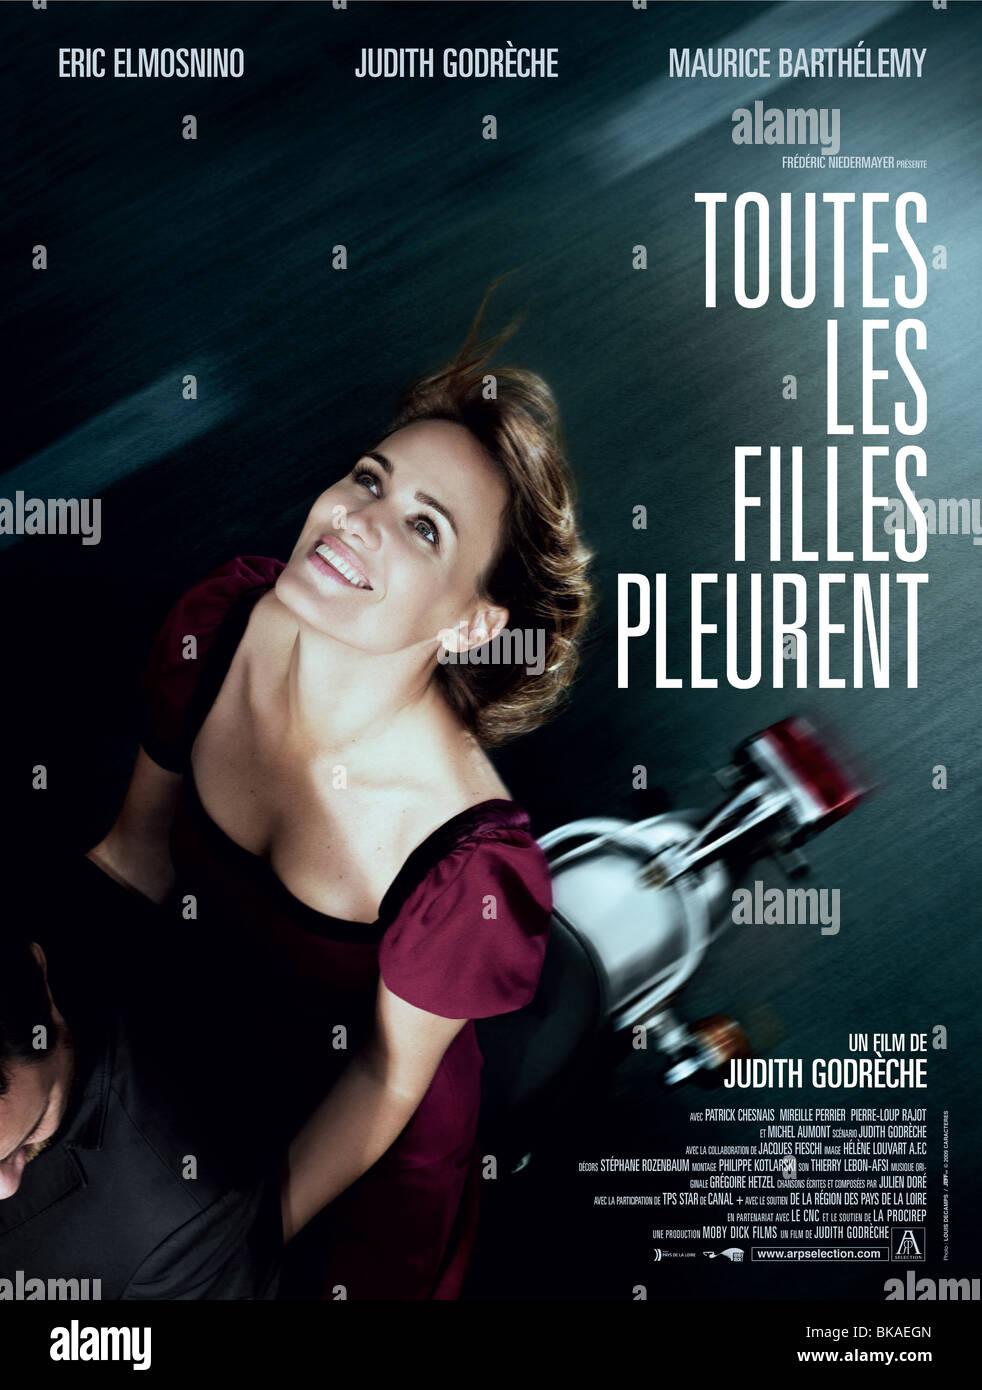 Toutes les filles pleurent Year : 2010 France Director : Judith Godrèche Judith Godrèche Movie poster - Stock Image